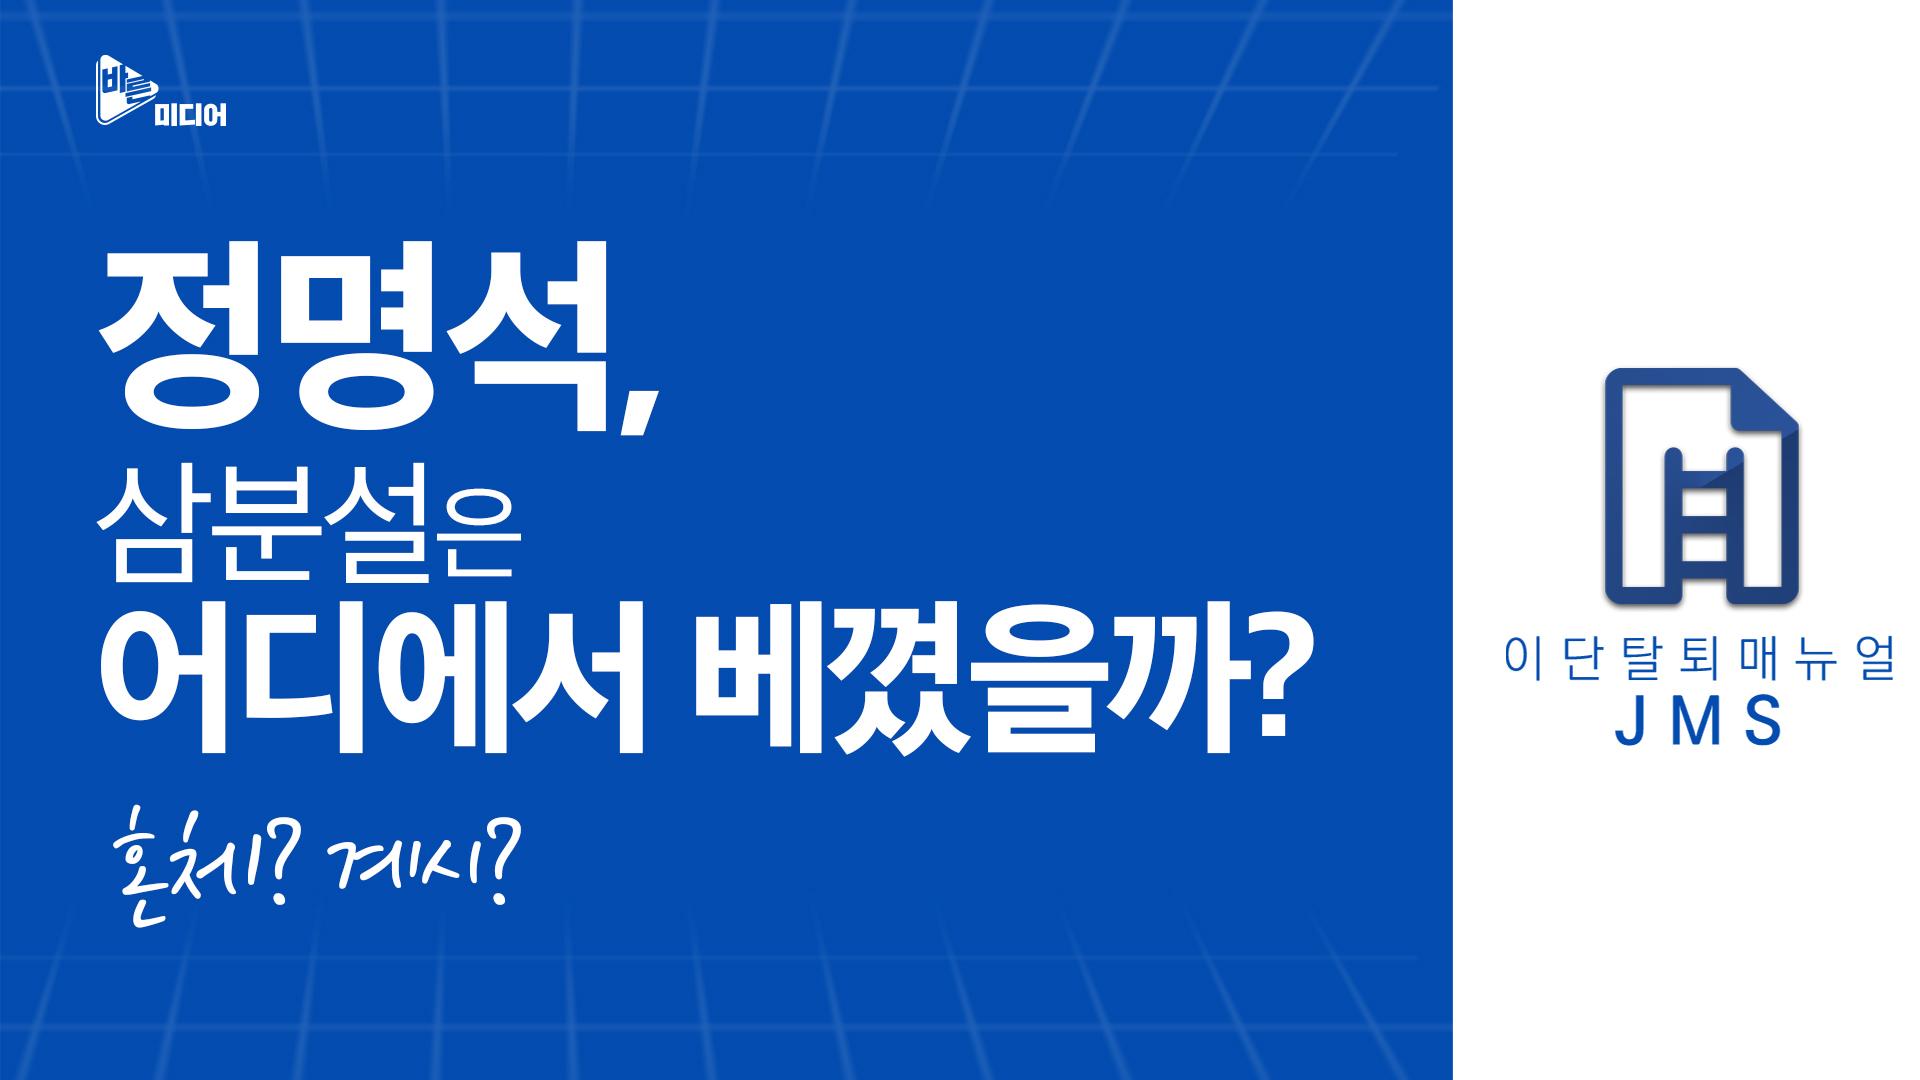 [JMS] 정명석, 삼분설은 어디에서 베꼈을까?